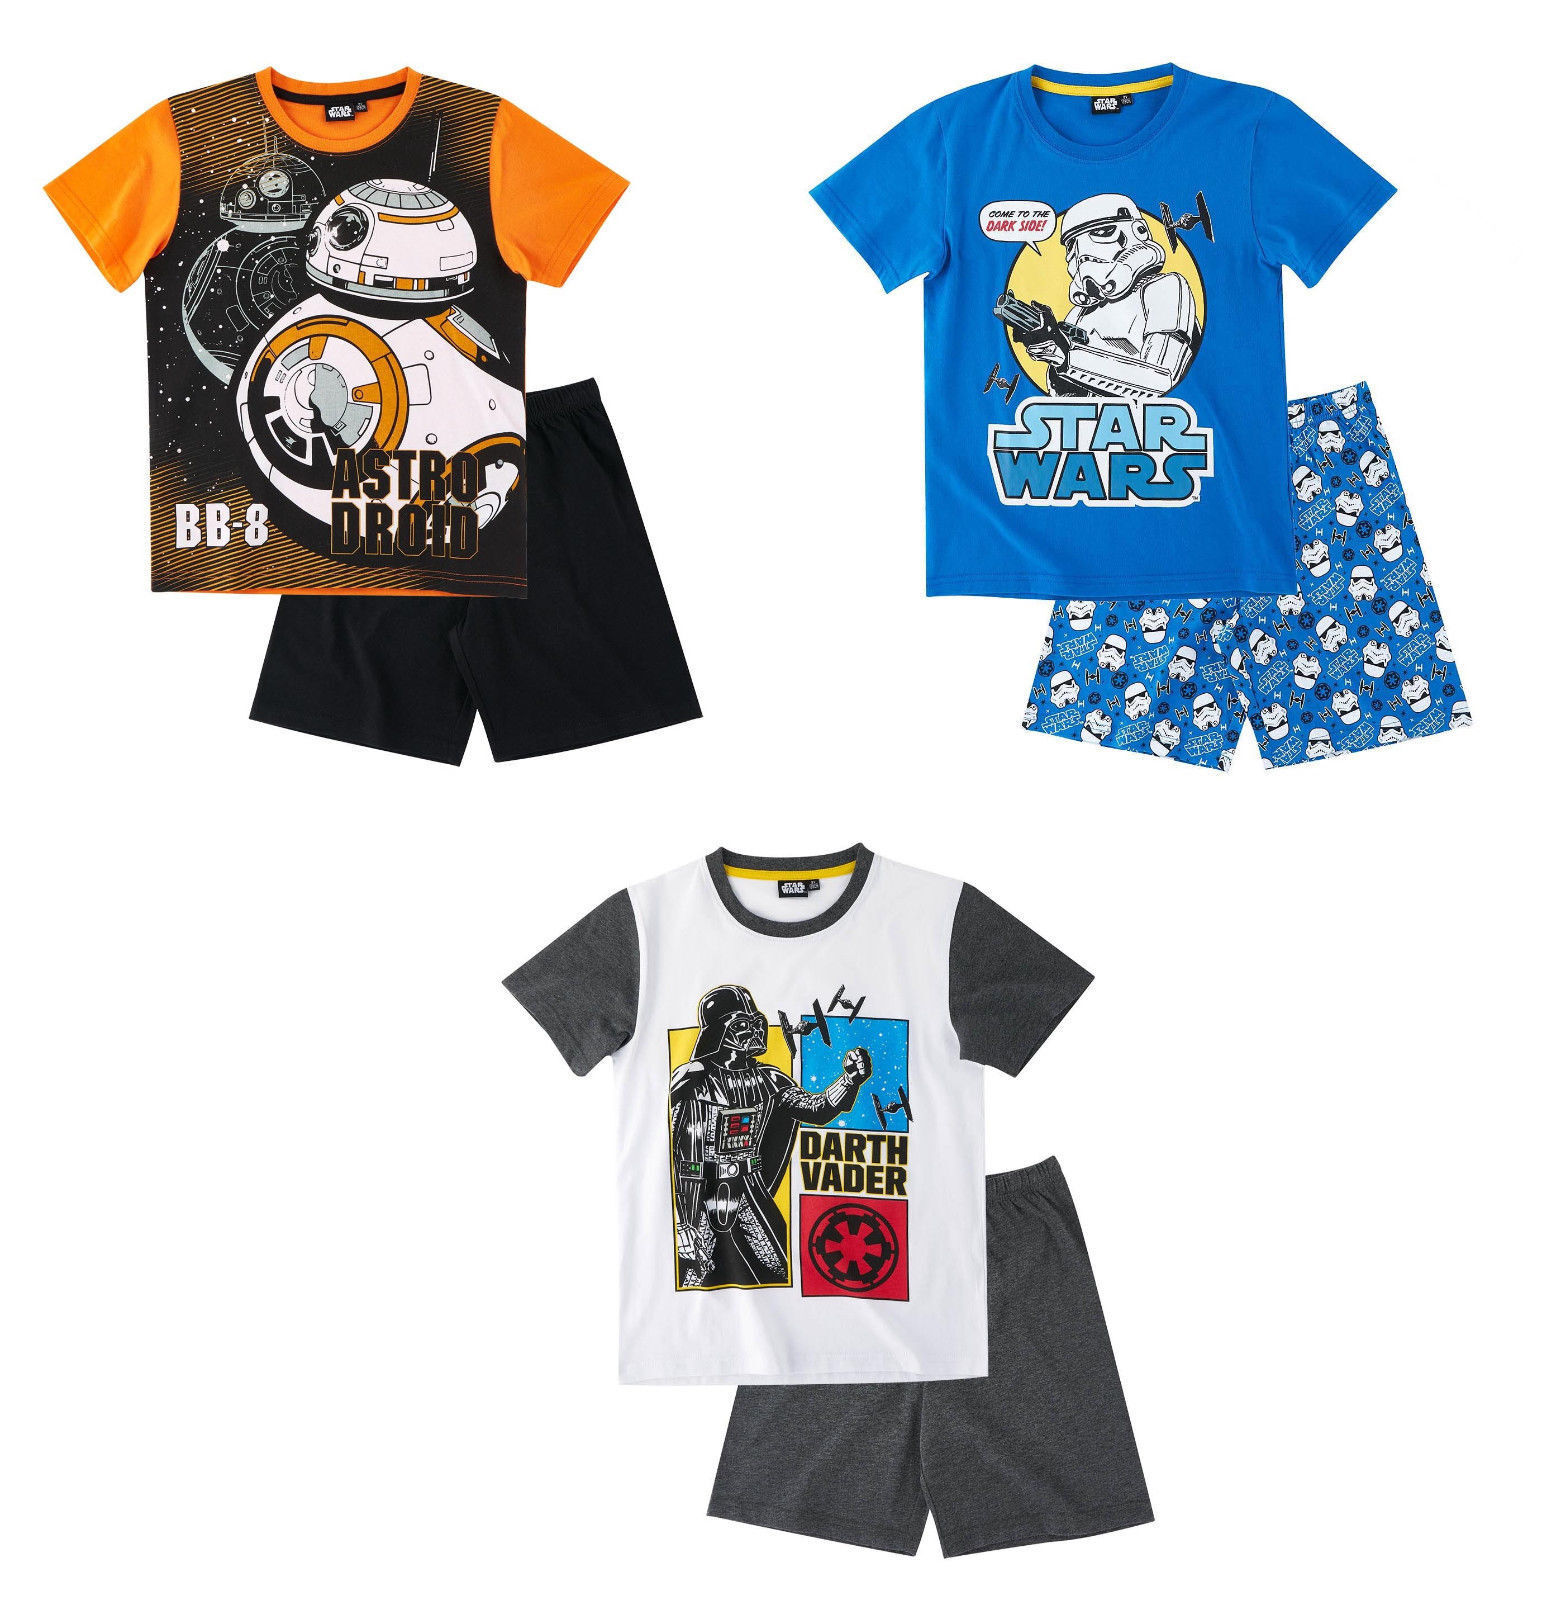 0d3e69f512 Star Wars Kinder Jungen Shorty Pyjama 116-152 Schlafanzug kurz Nachtwäsche  neu!*